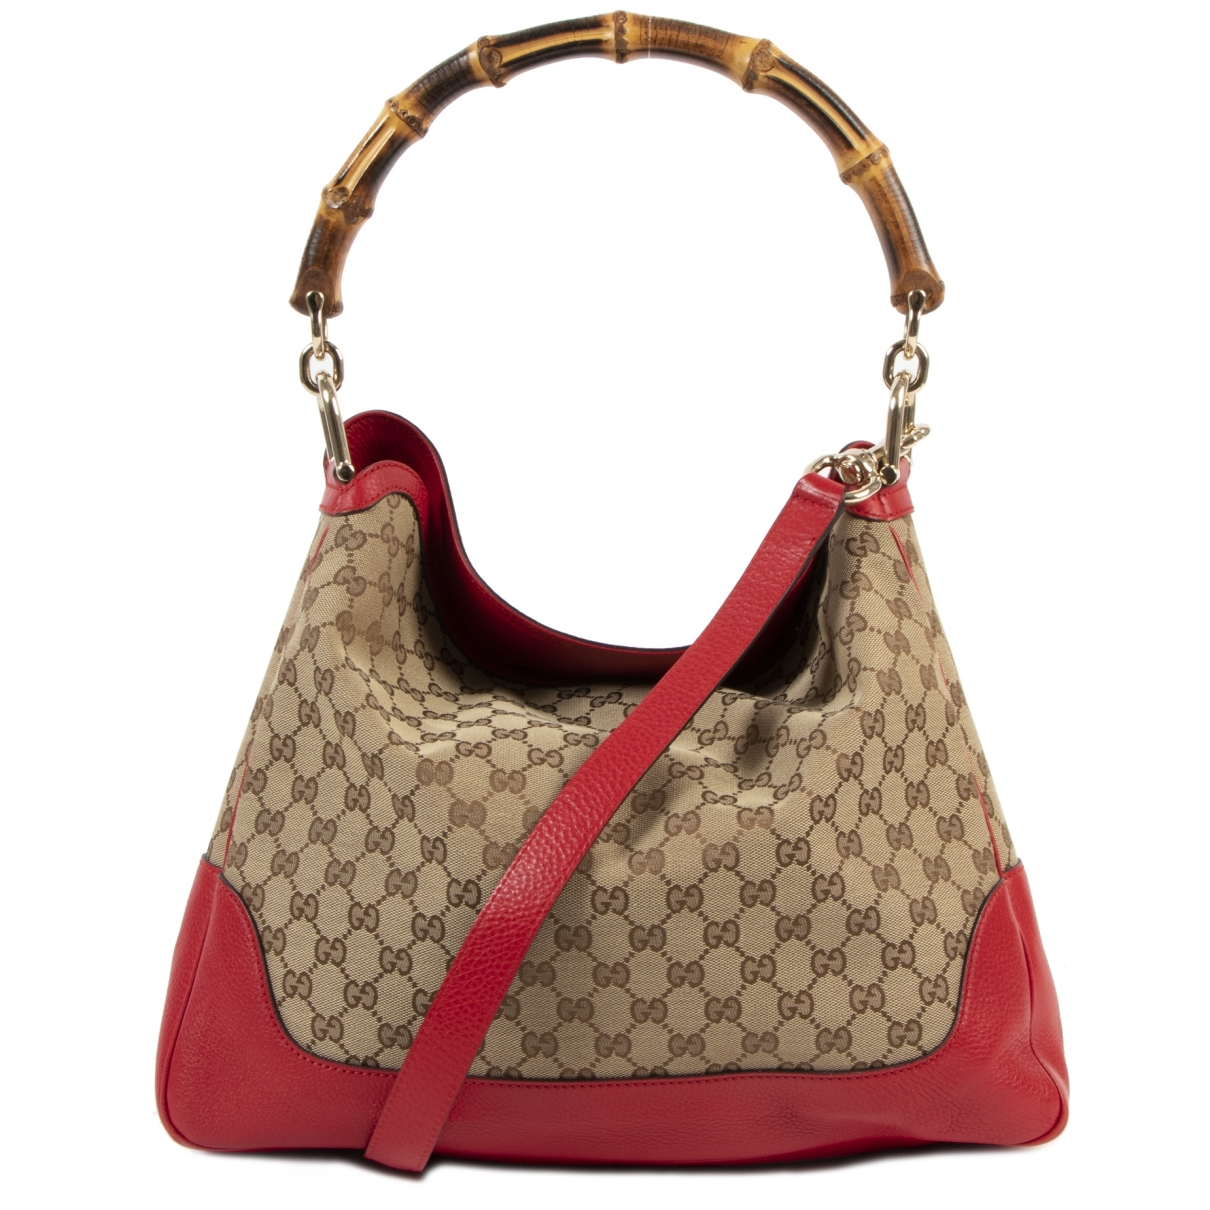 Gucci Bamboo Handtasche in  Bunt Leinen